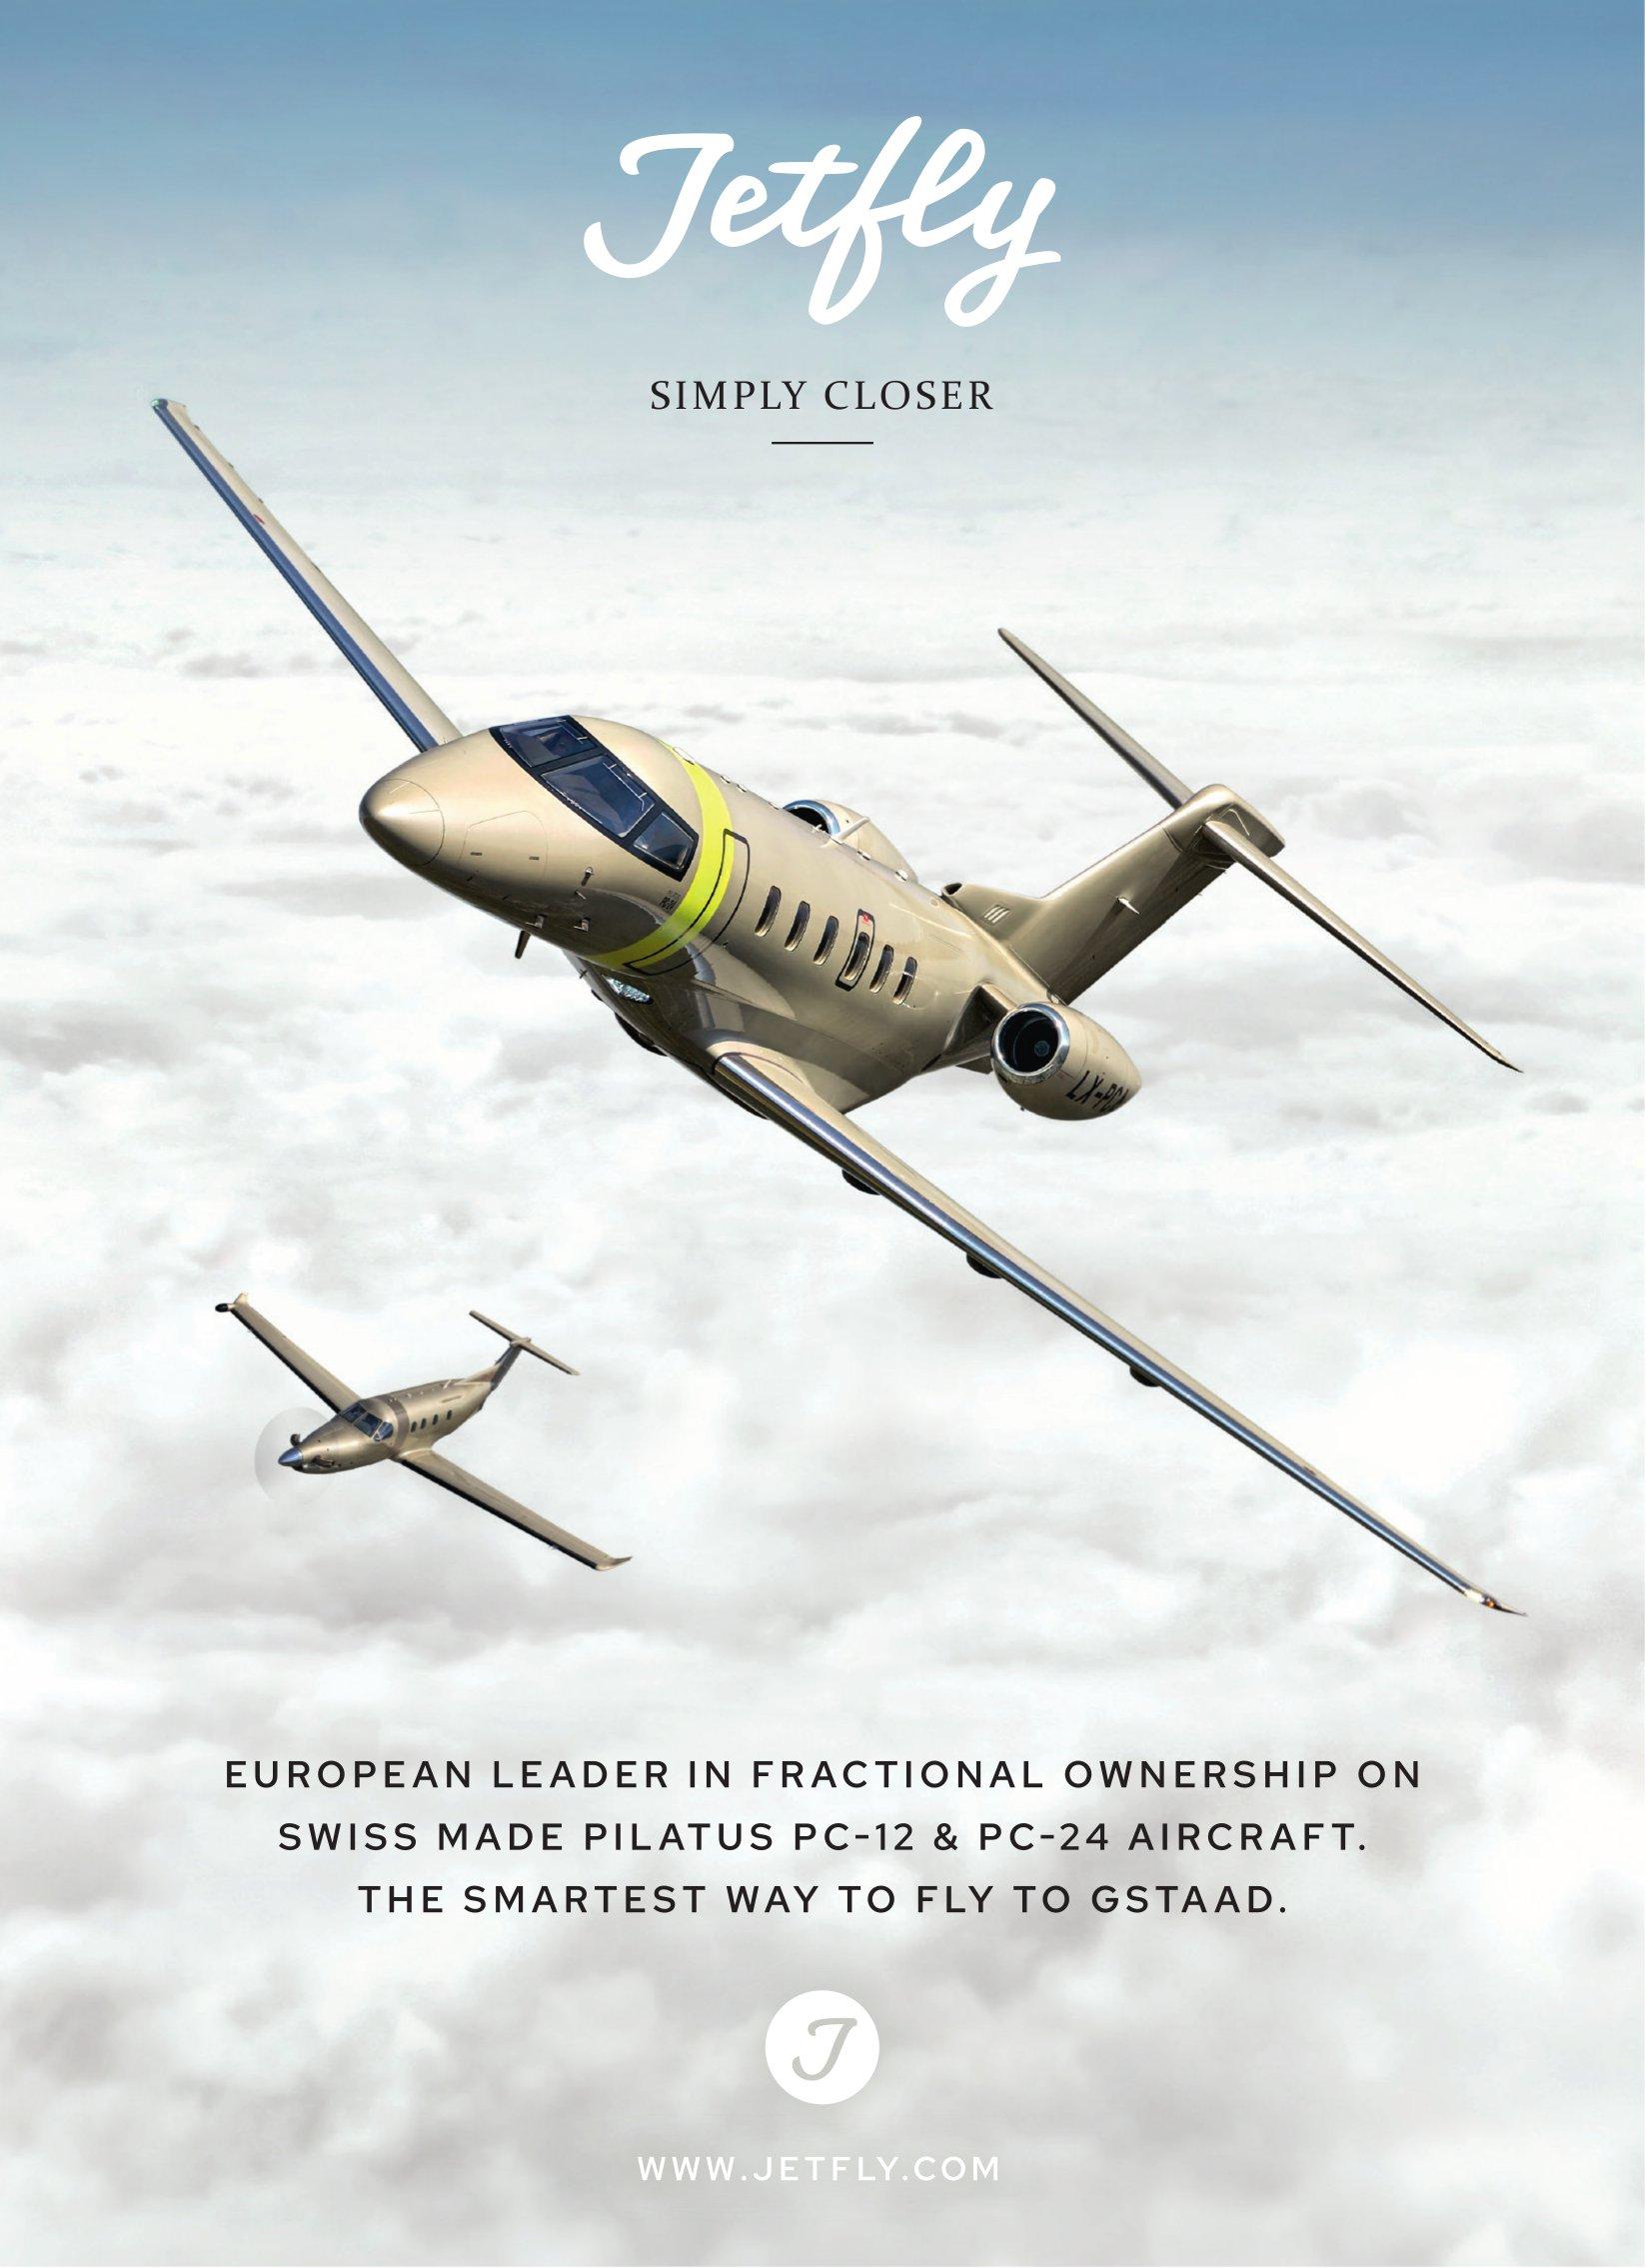 Jetfly - Simply closer